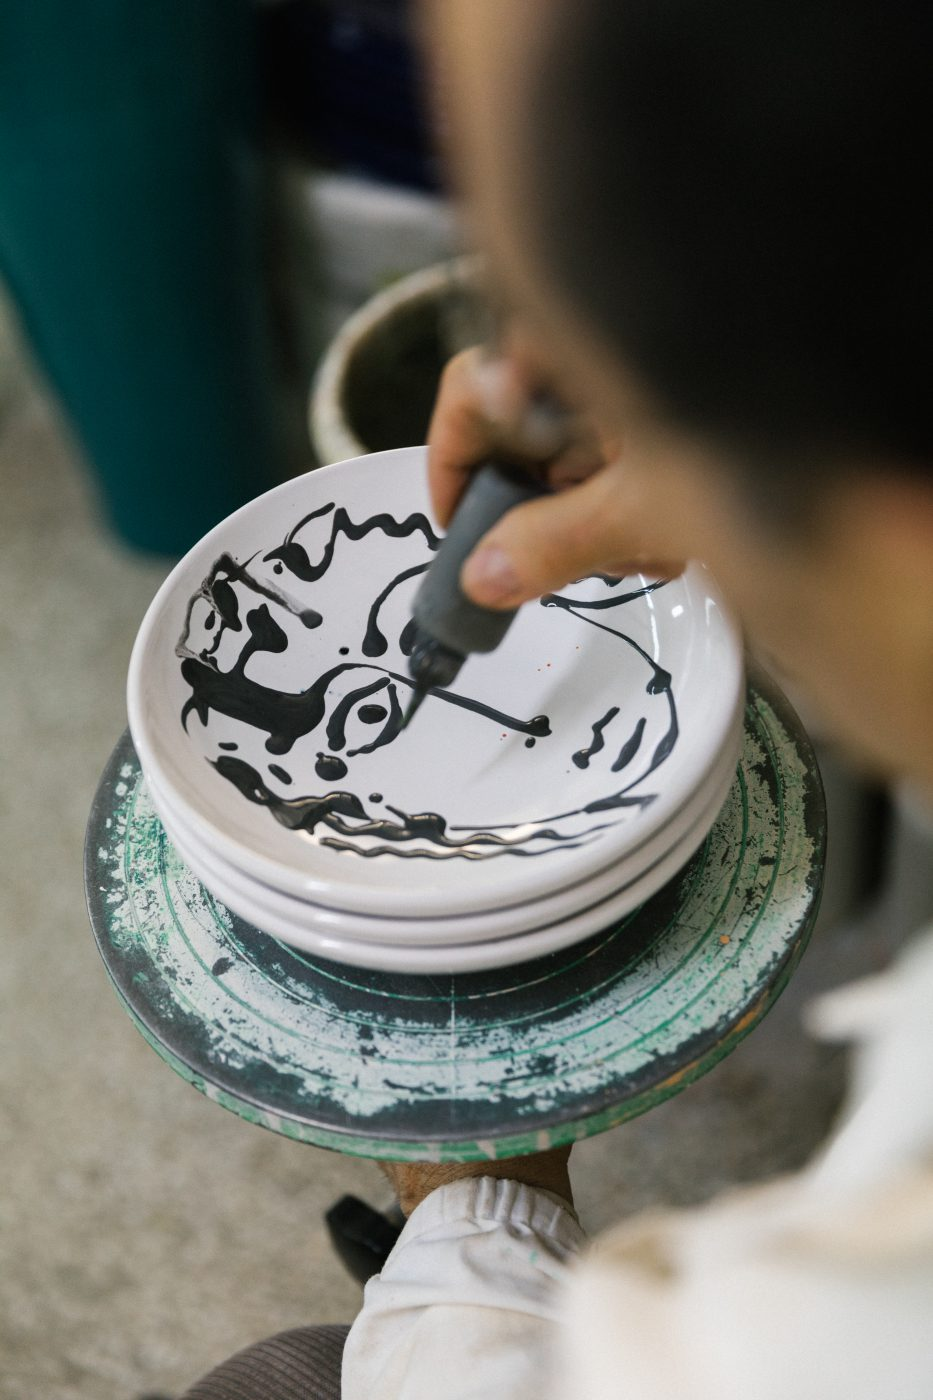 Franco Fasano in the ceramic district of Grottaglie.